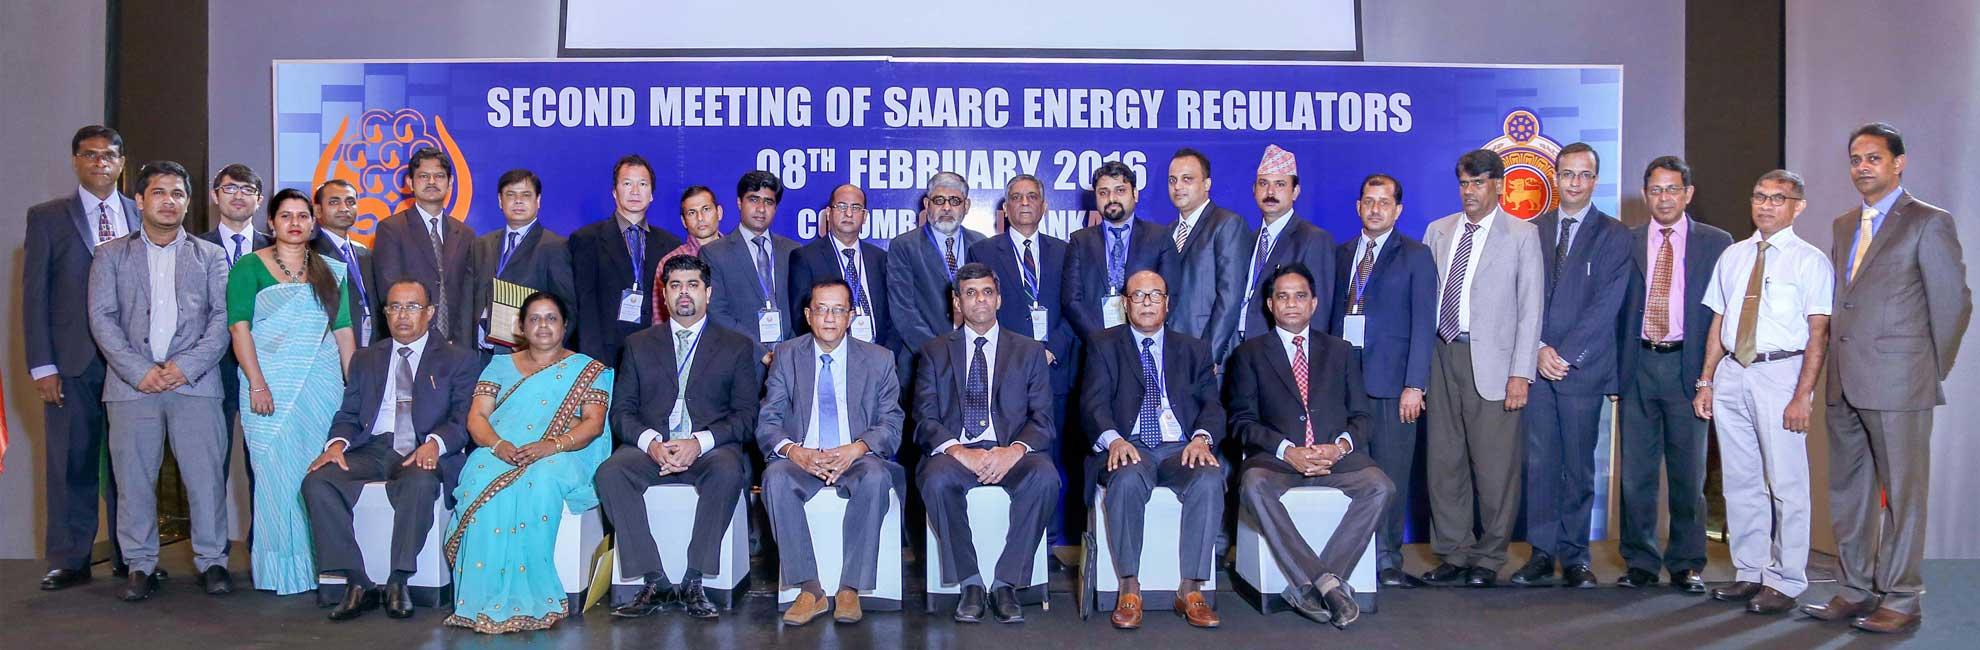 SARI/EI Delegation to the 2nd Meeting of SAARC Energy Regulators